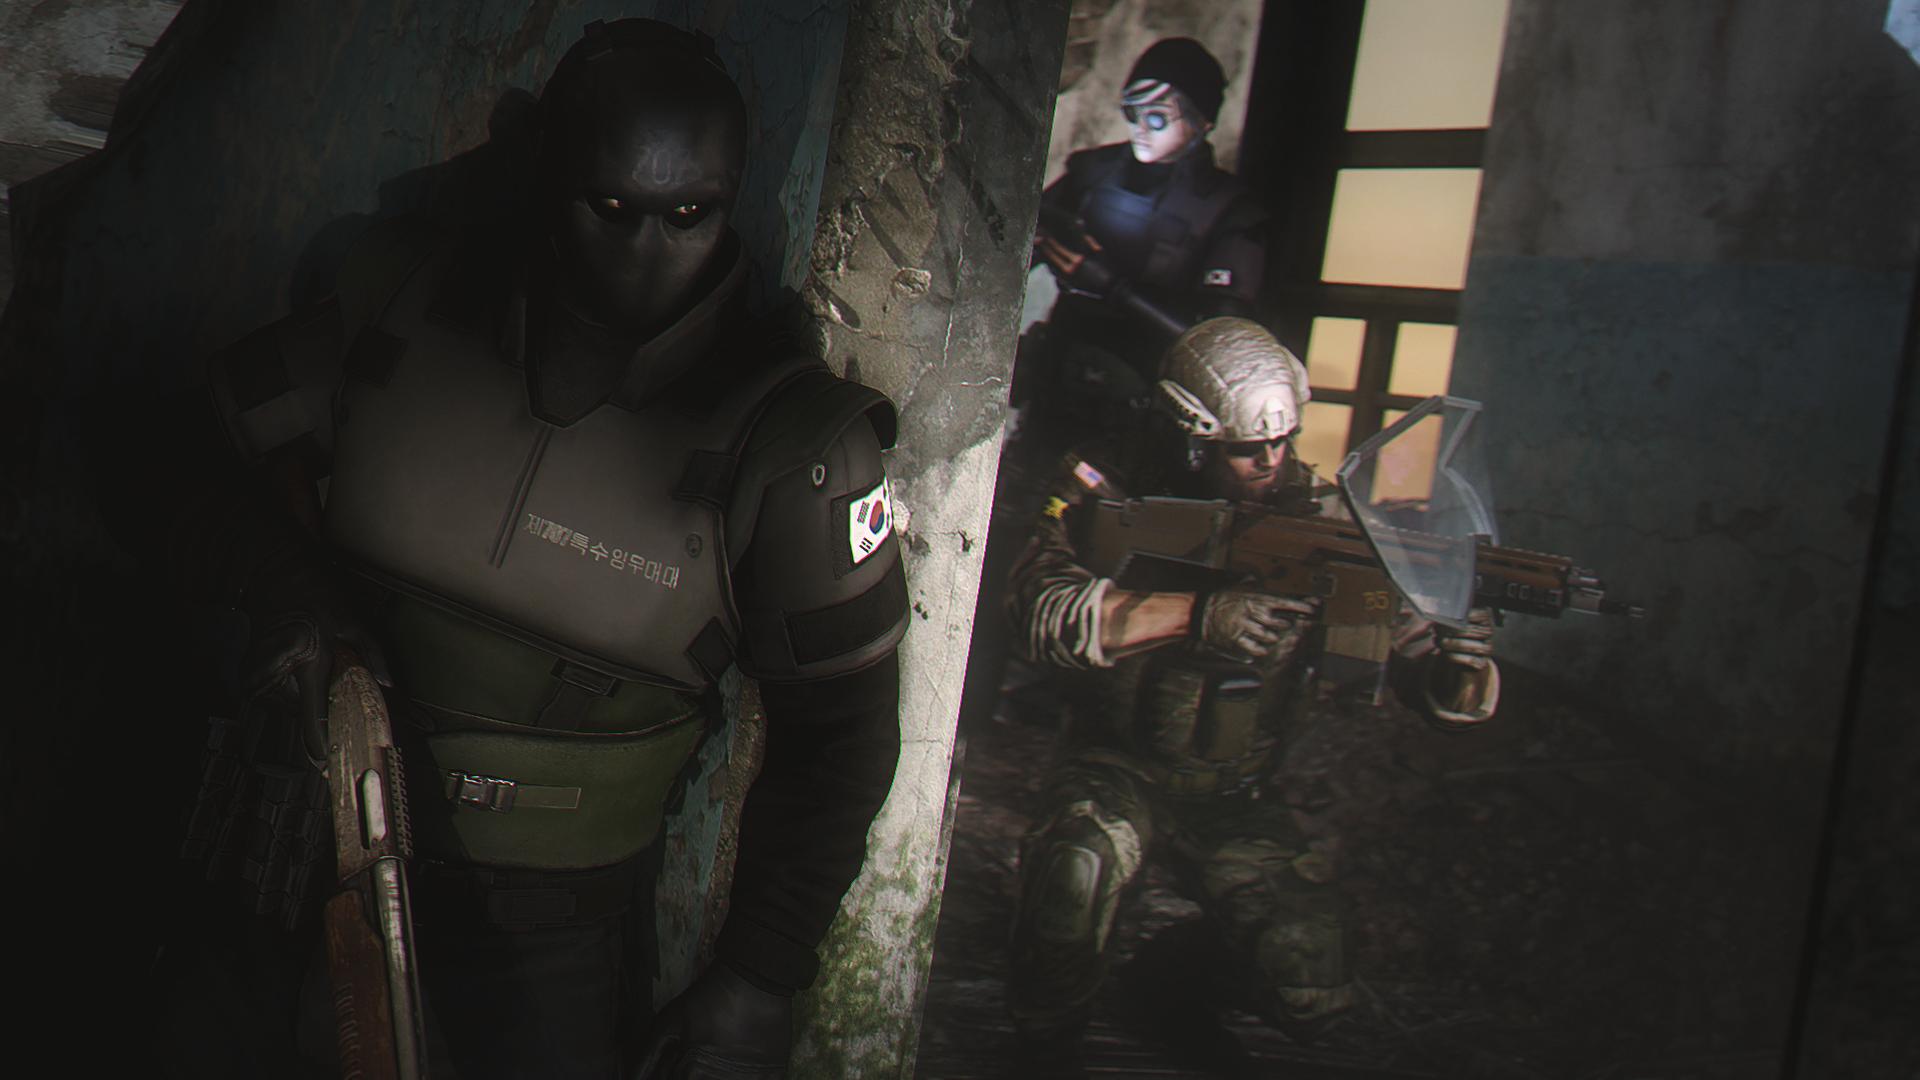 The Shadow Rainbow Six Siege By Angryrabbitgmod On Deviantart